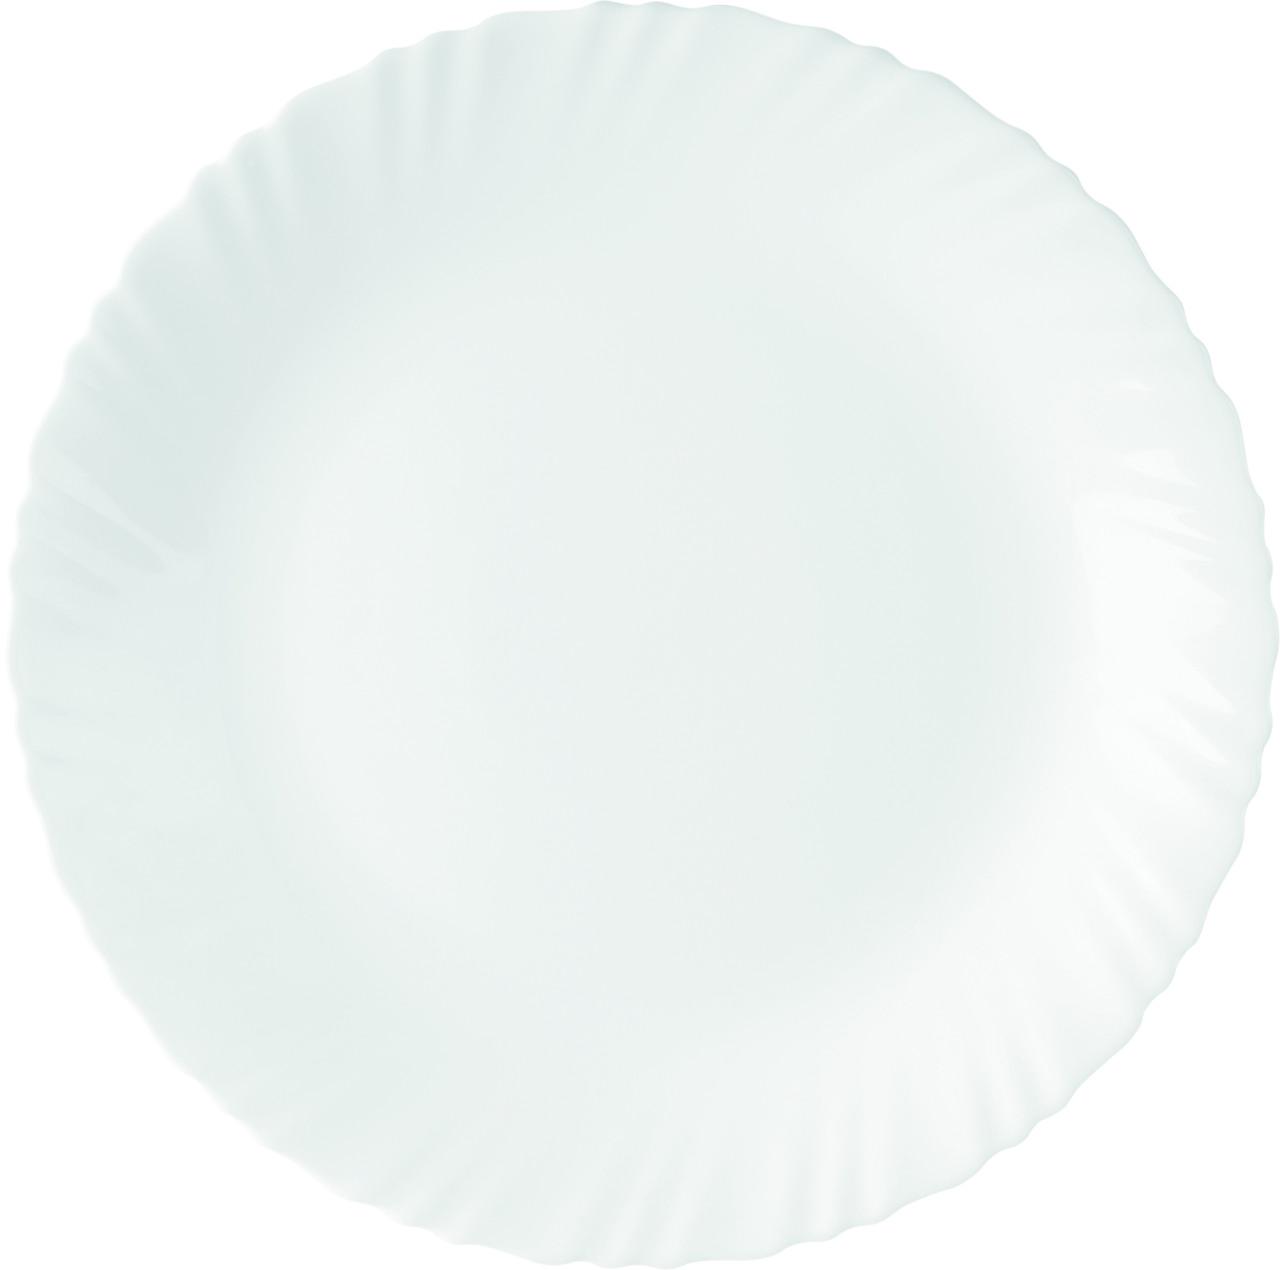 Тарелка обеденная Rak Glass круглая 25 см